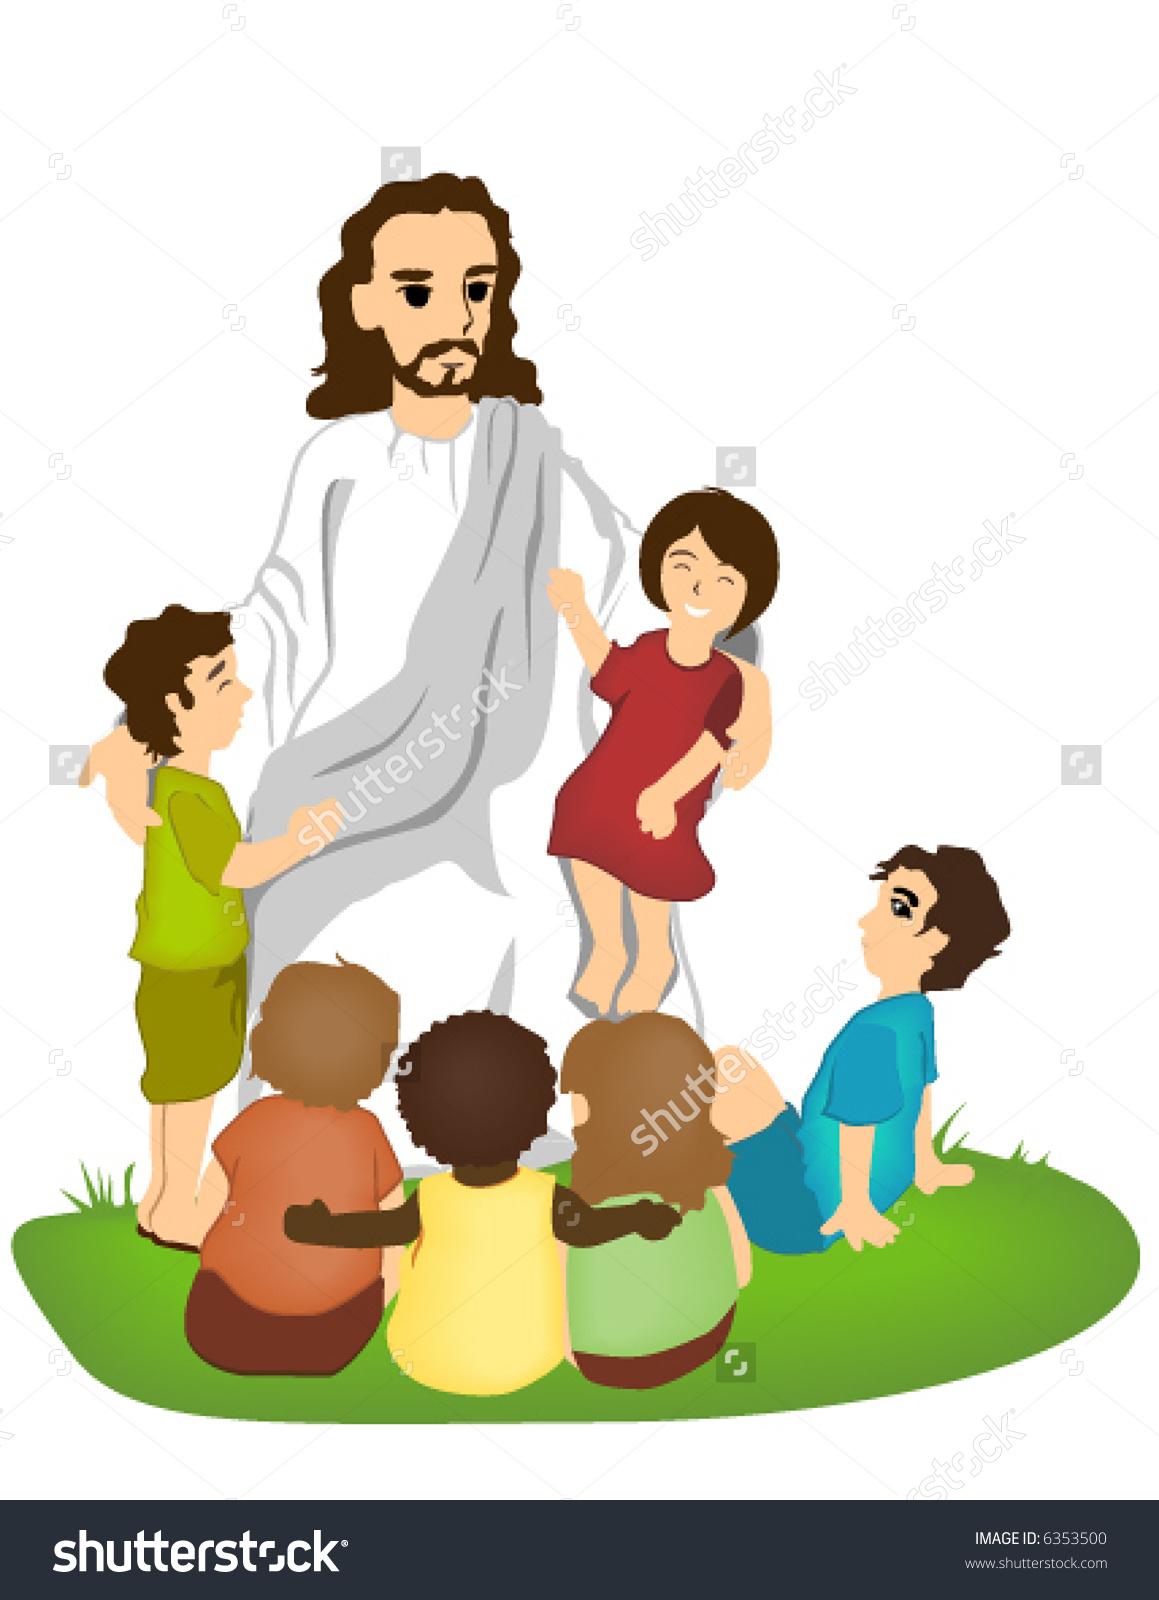 jesus children clipart.